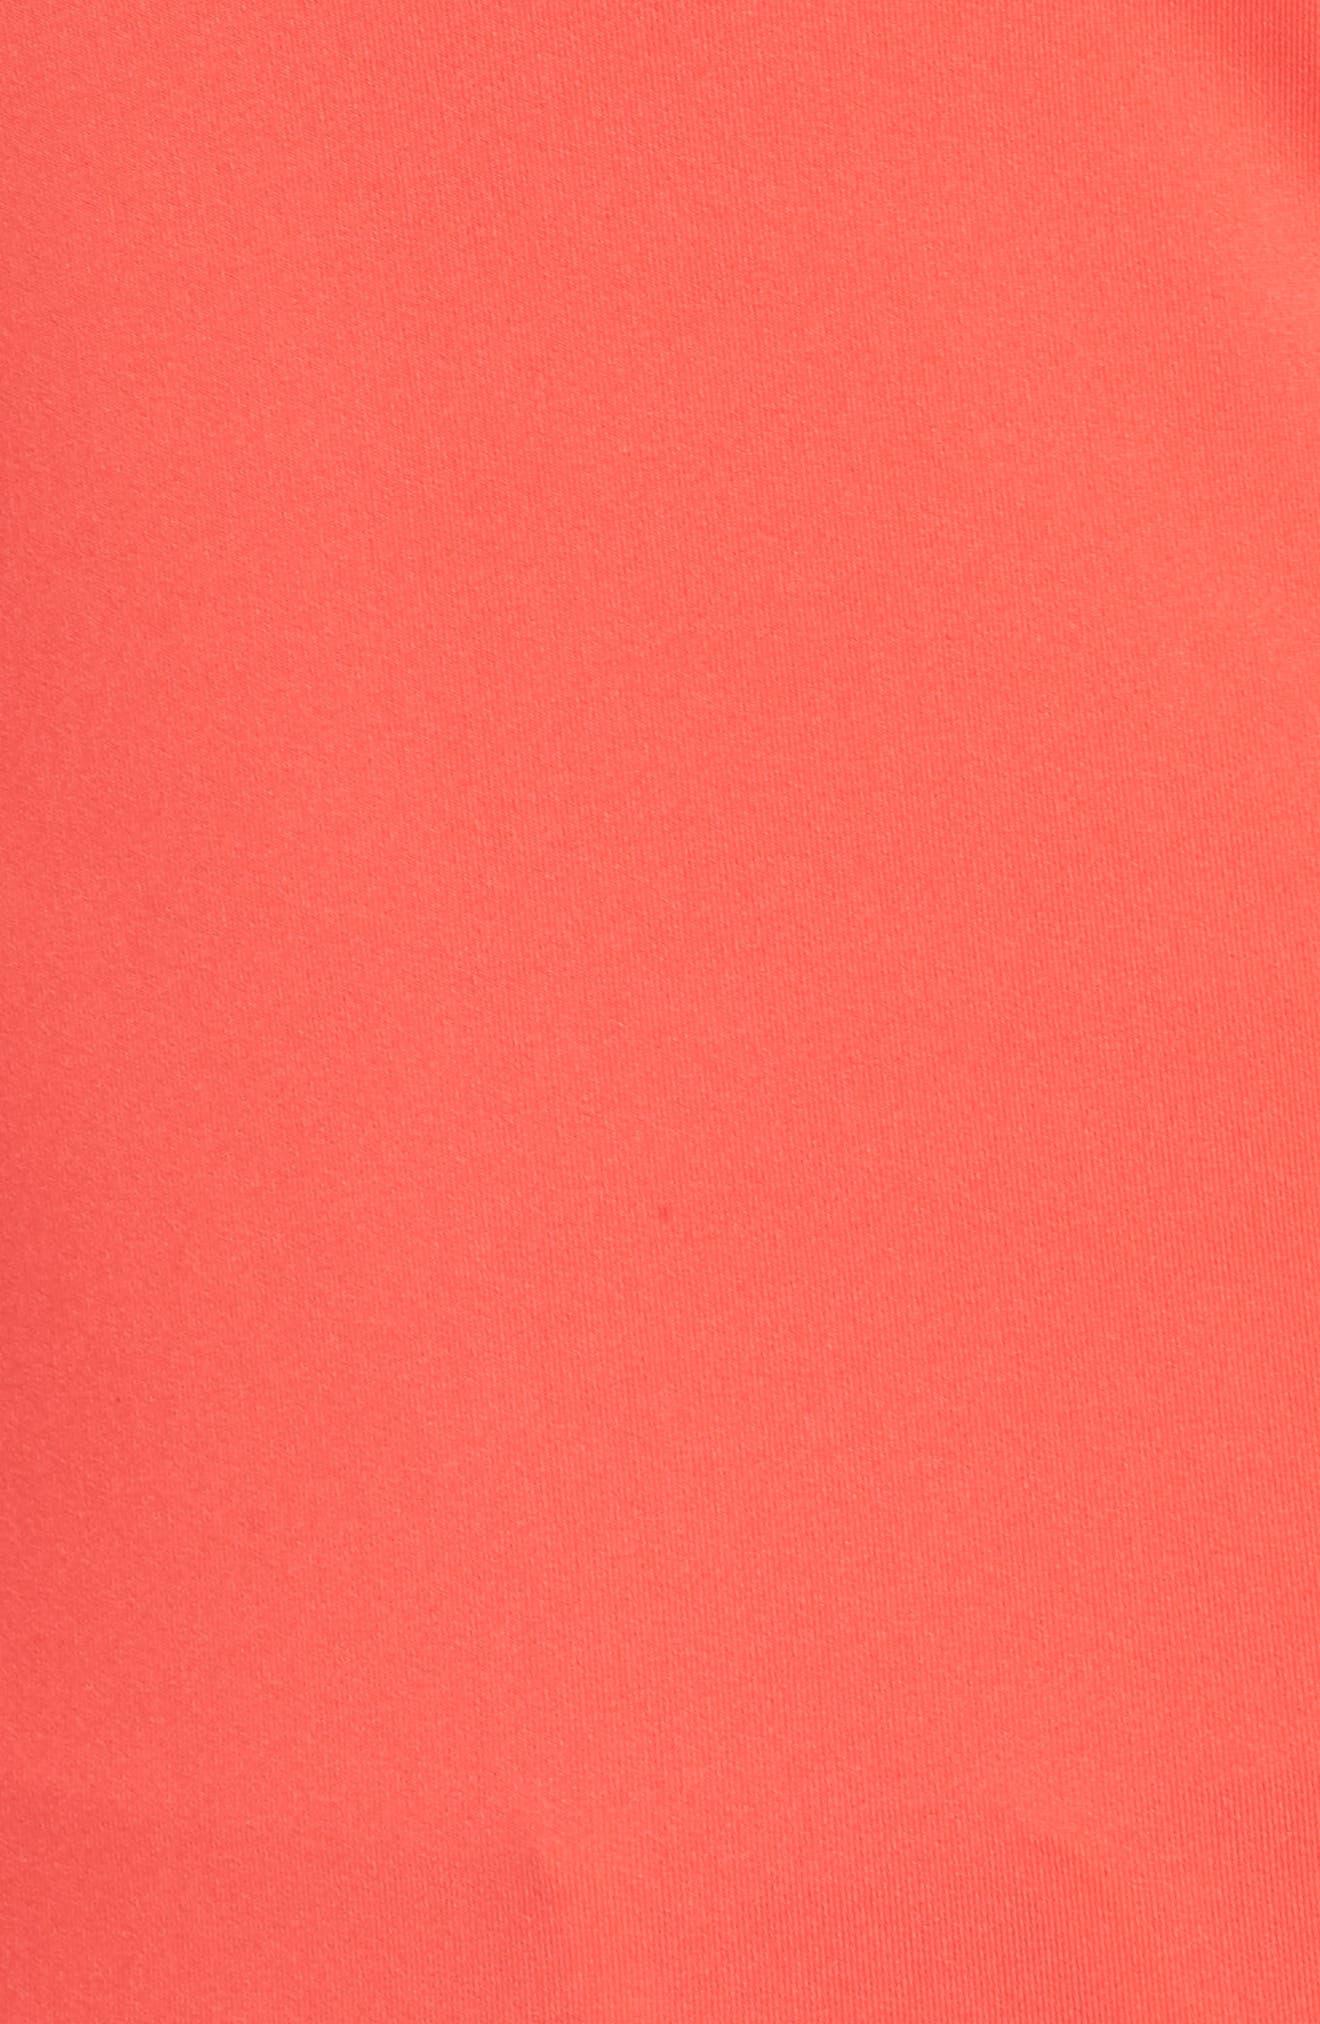 Realized Long Sleeve Tee,                             Alternate thumbnail 30, color,